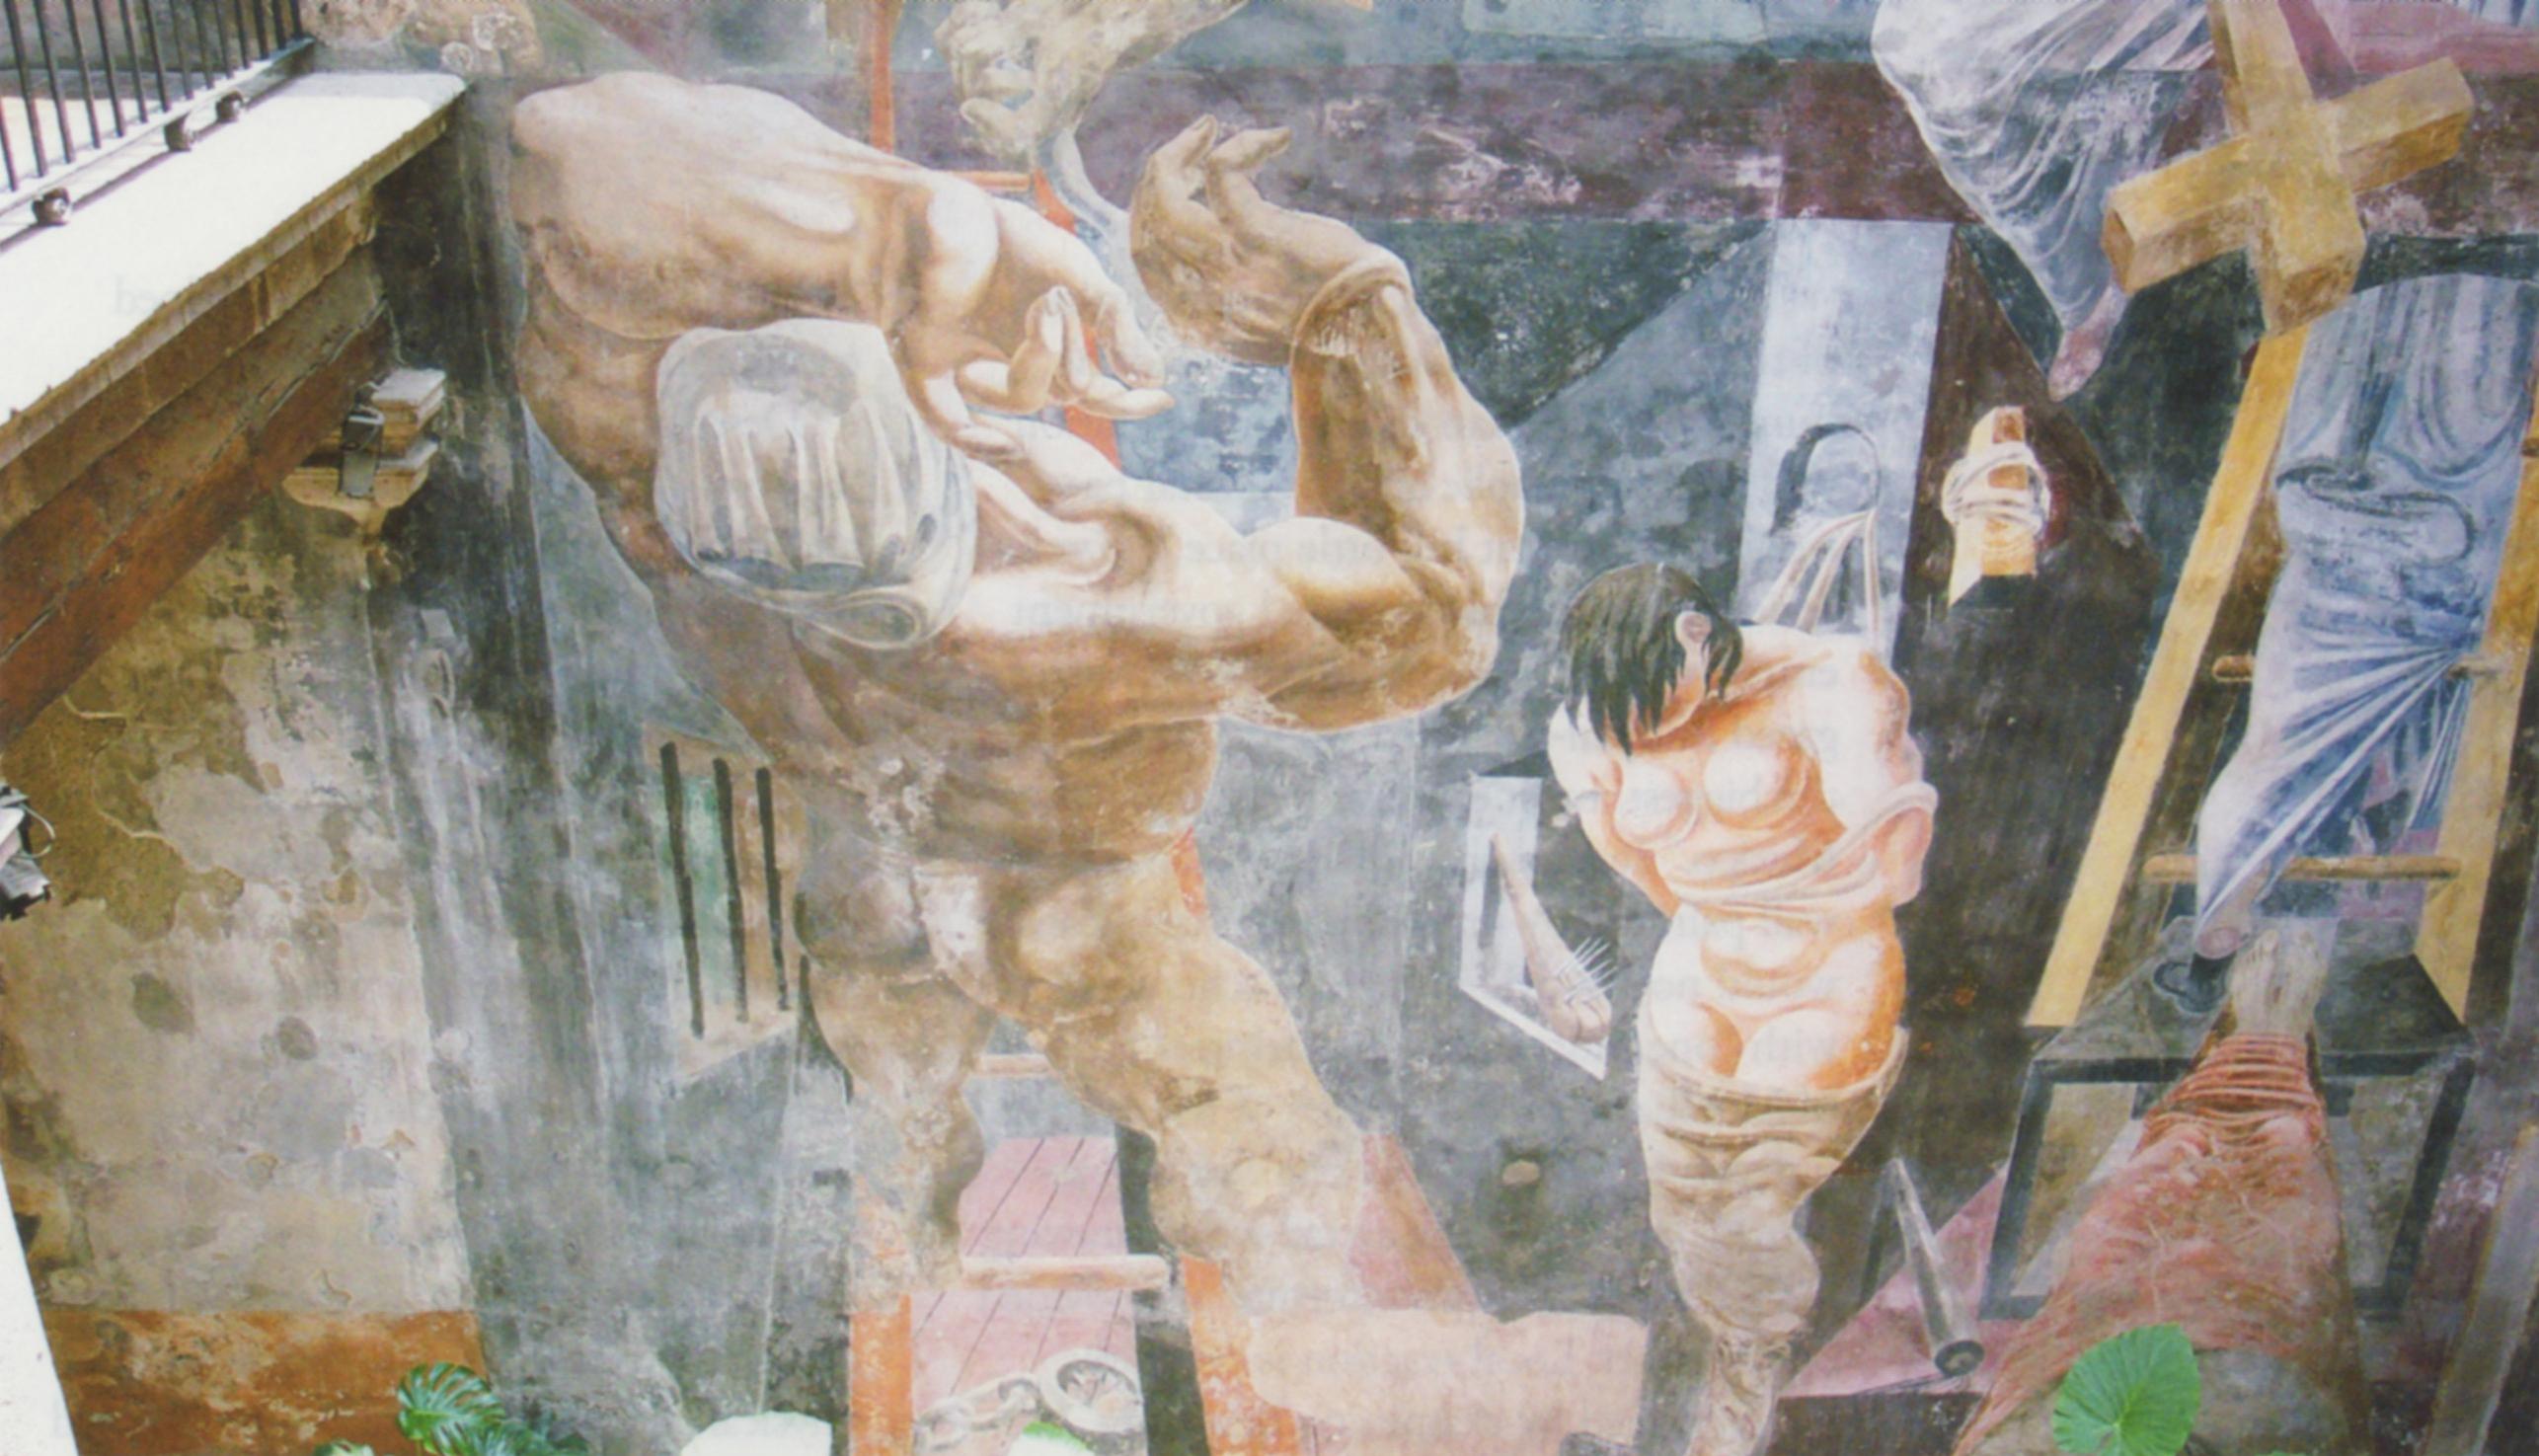 (fig. 16) Philip Guston, Reuben Kadish (and Jules Langsner), The Struggle against Terrorism, 1934-35. Detail of falling man from central panel. Photo, Ellen Landau